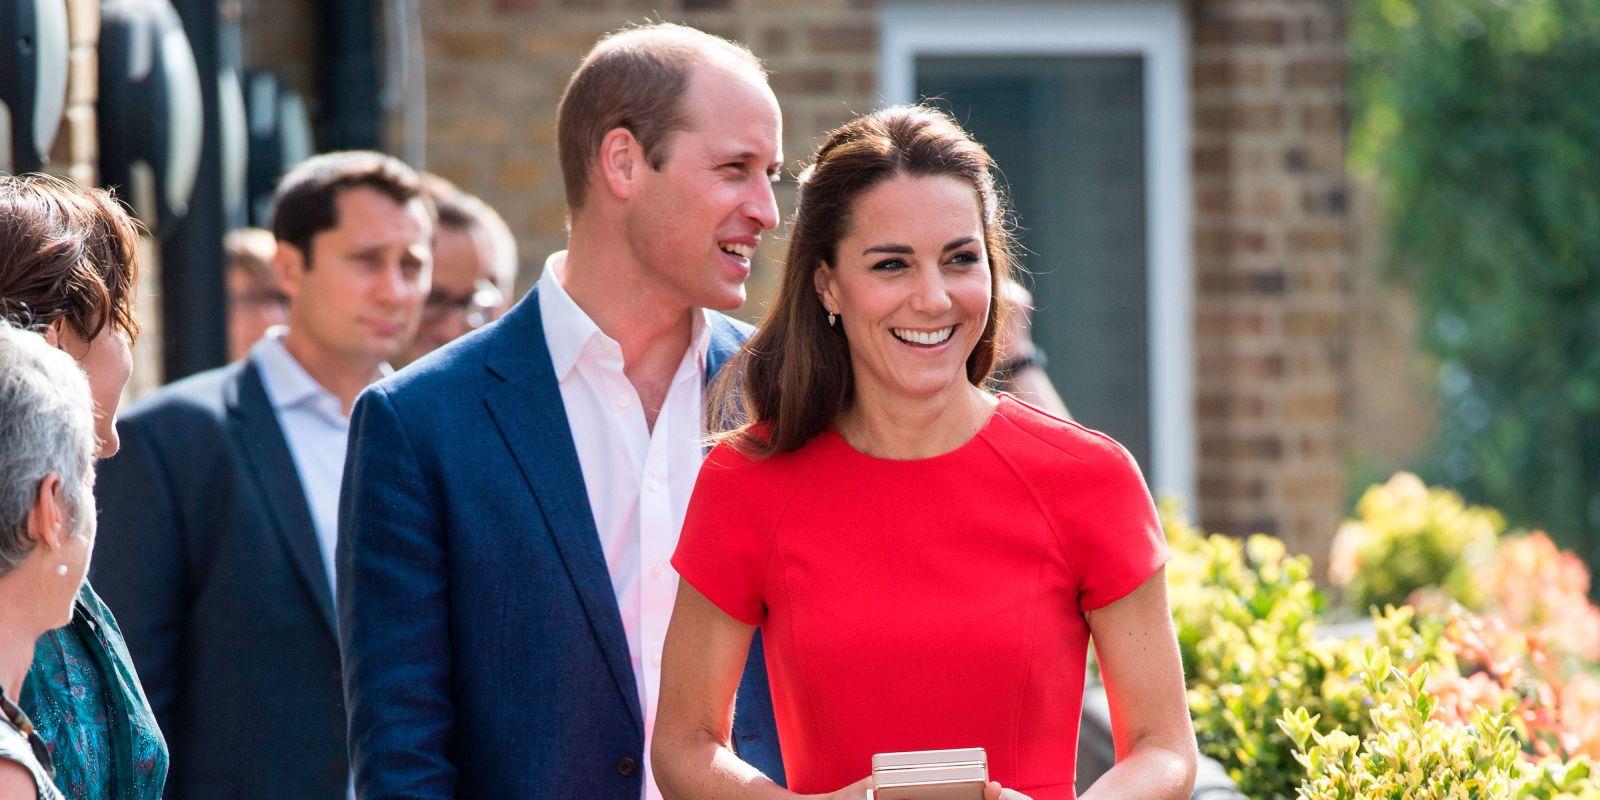 Best dressed this week 22 August Duchess of cambridge